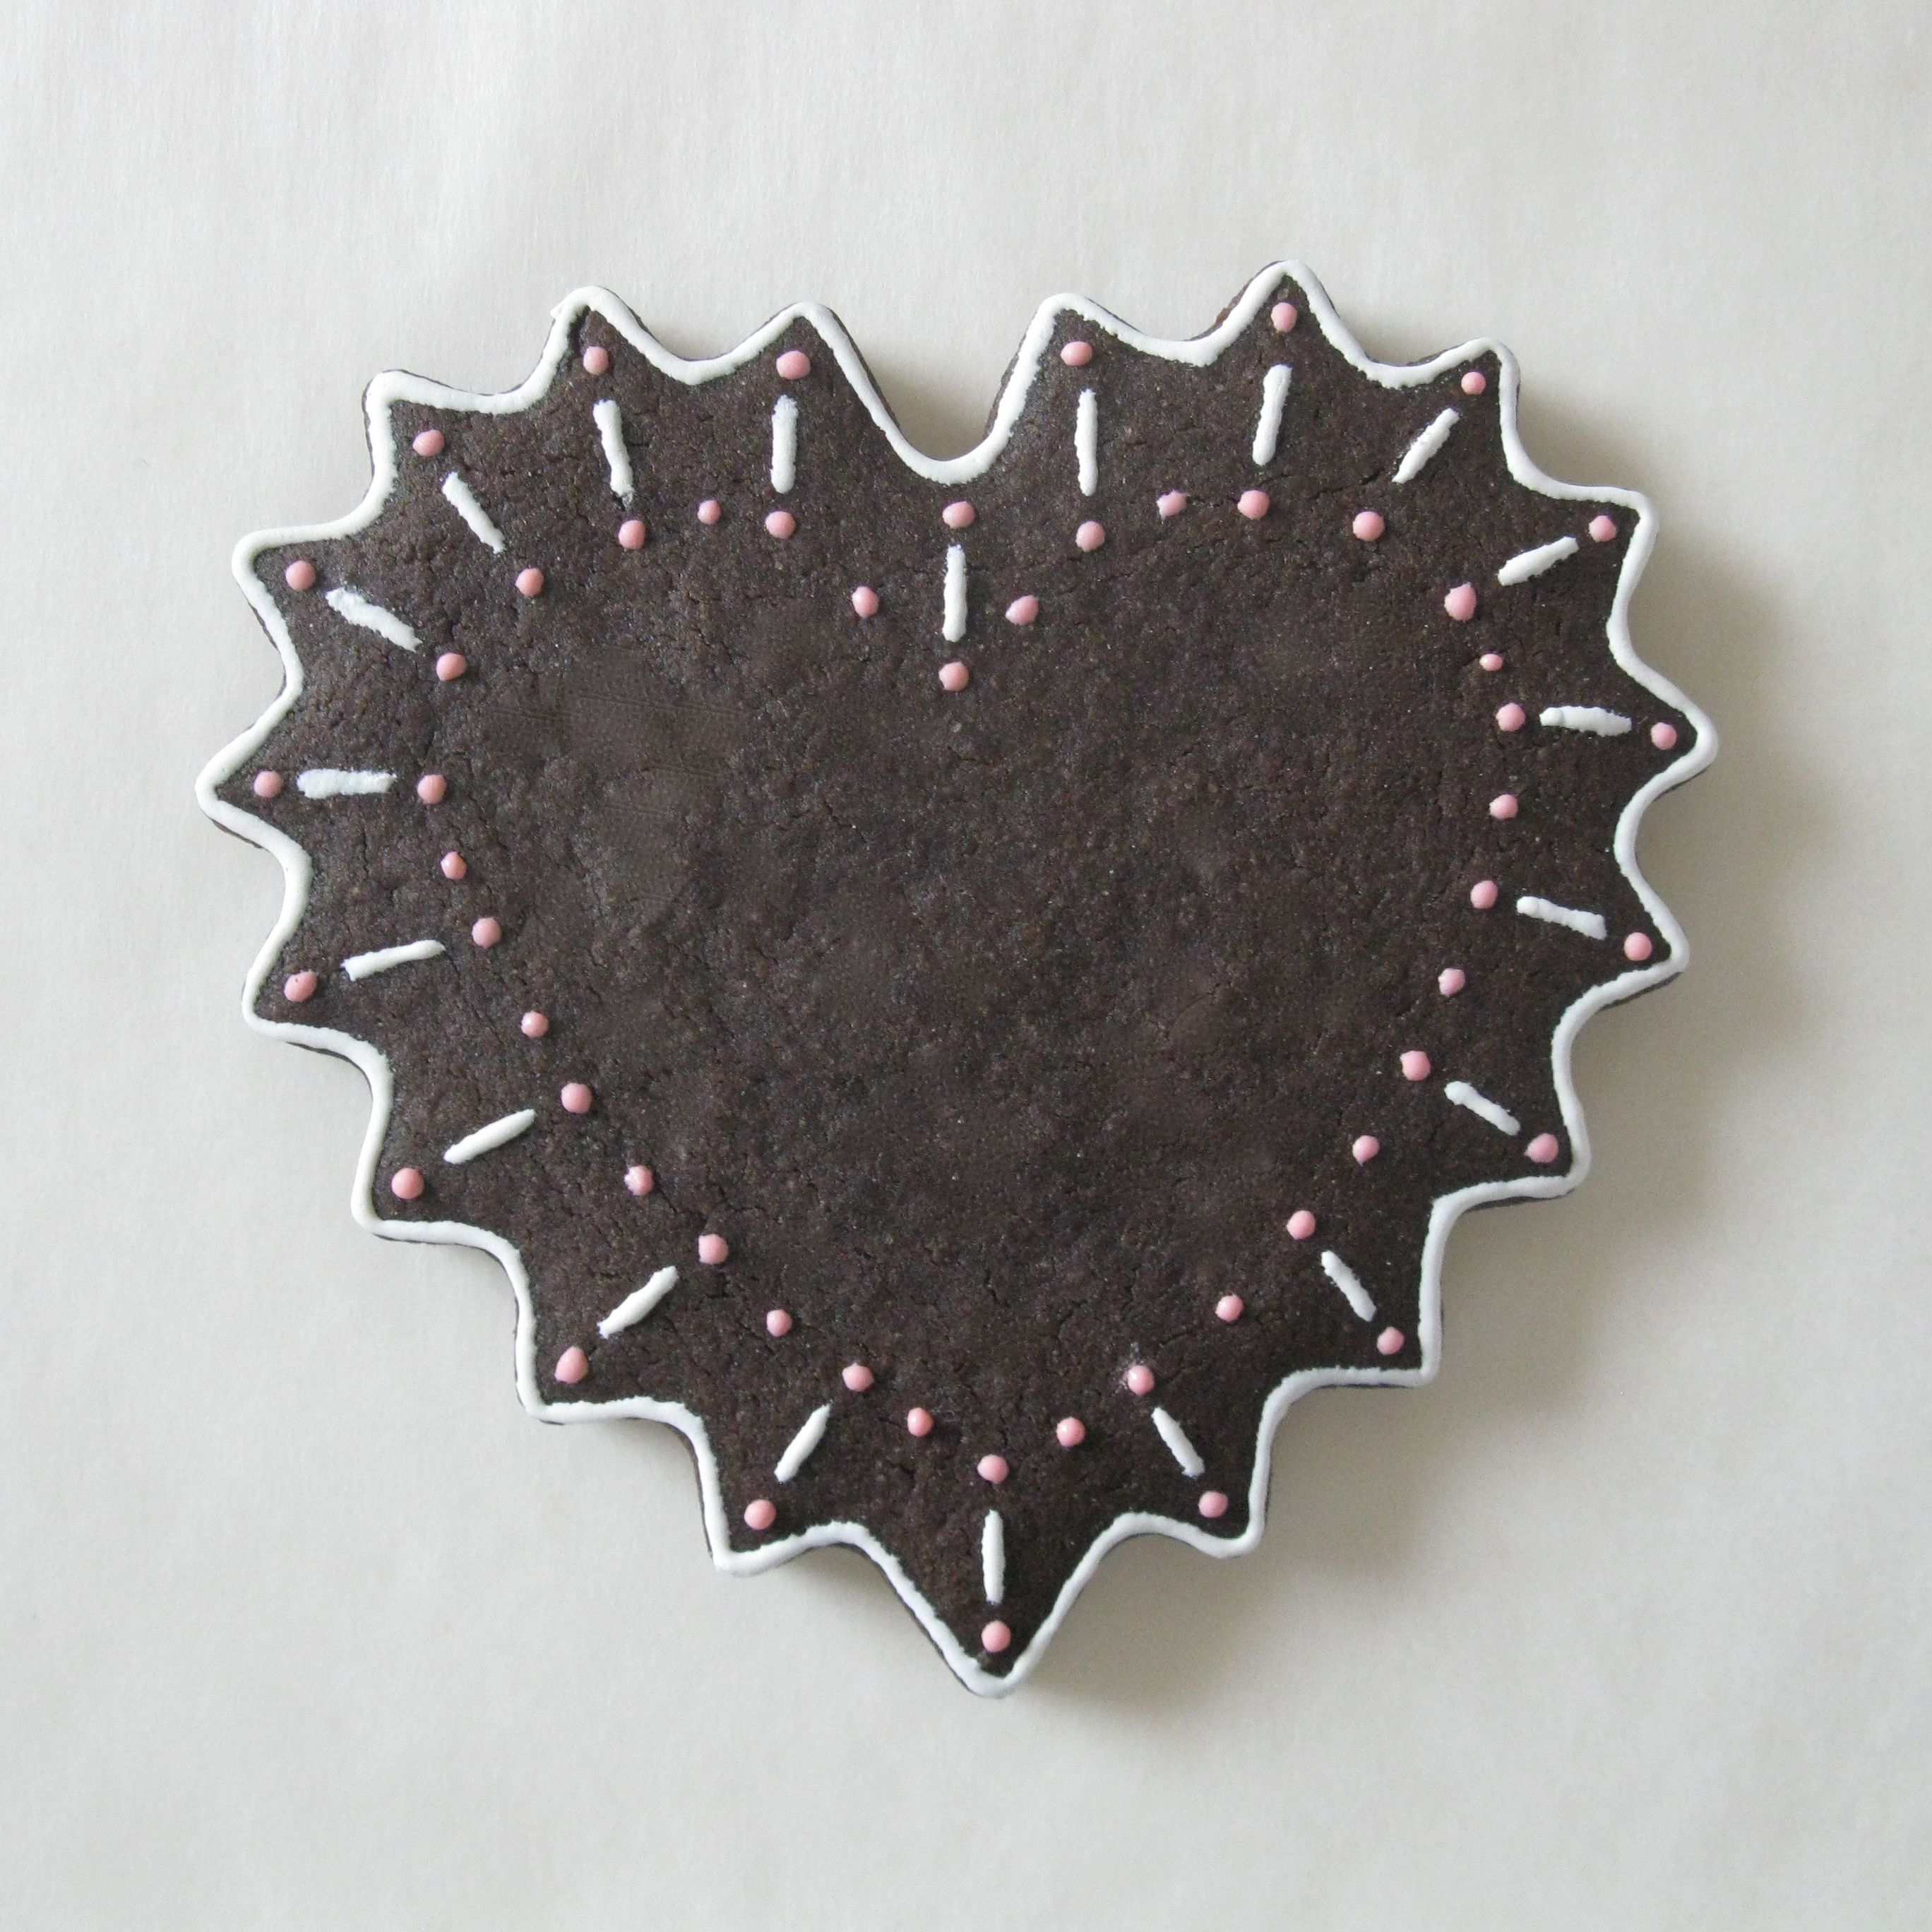 Chocolate Sugar Cookie   Lightly Decorated   J. Tamara